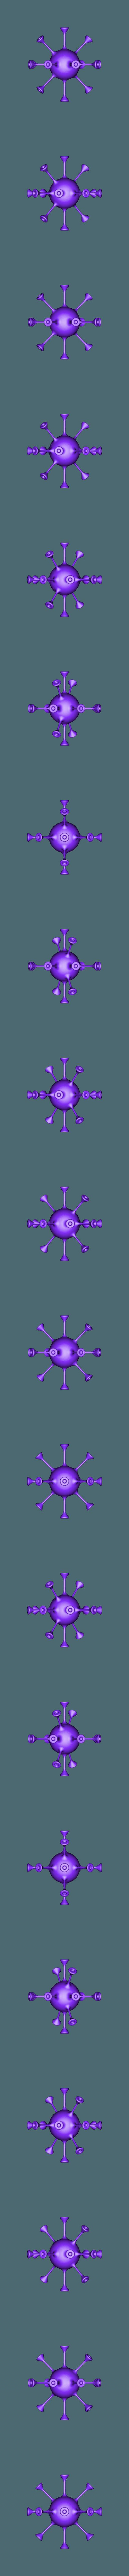 vir2019.stl Download free STL file coronavirus 3D MODEL 2019 • Object to 3D print, chernyavskayasve